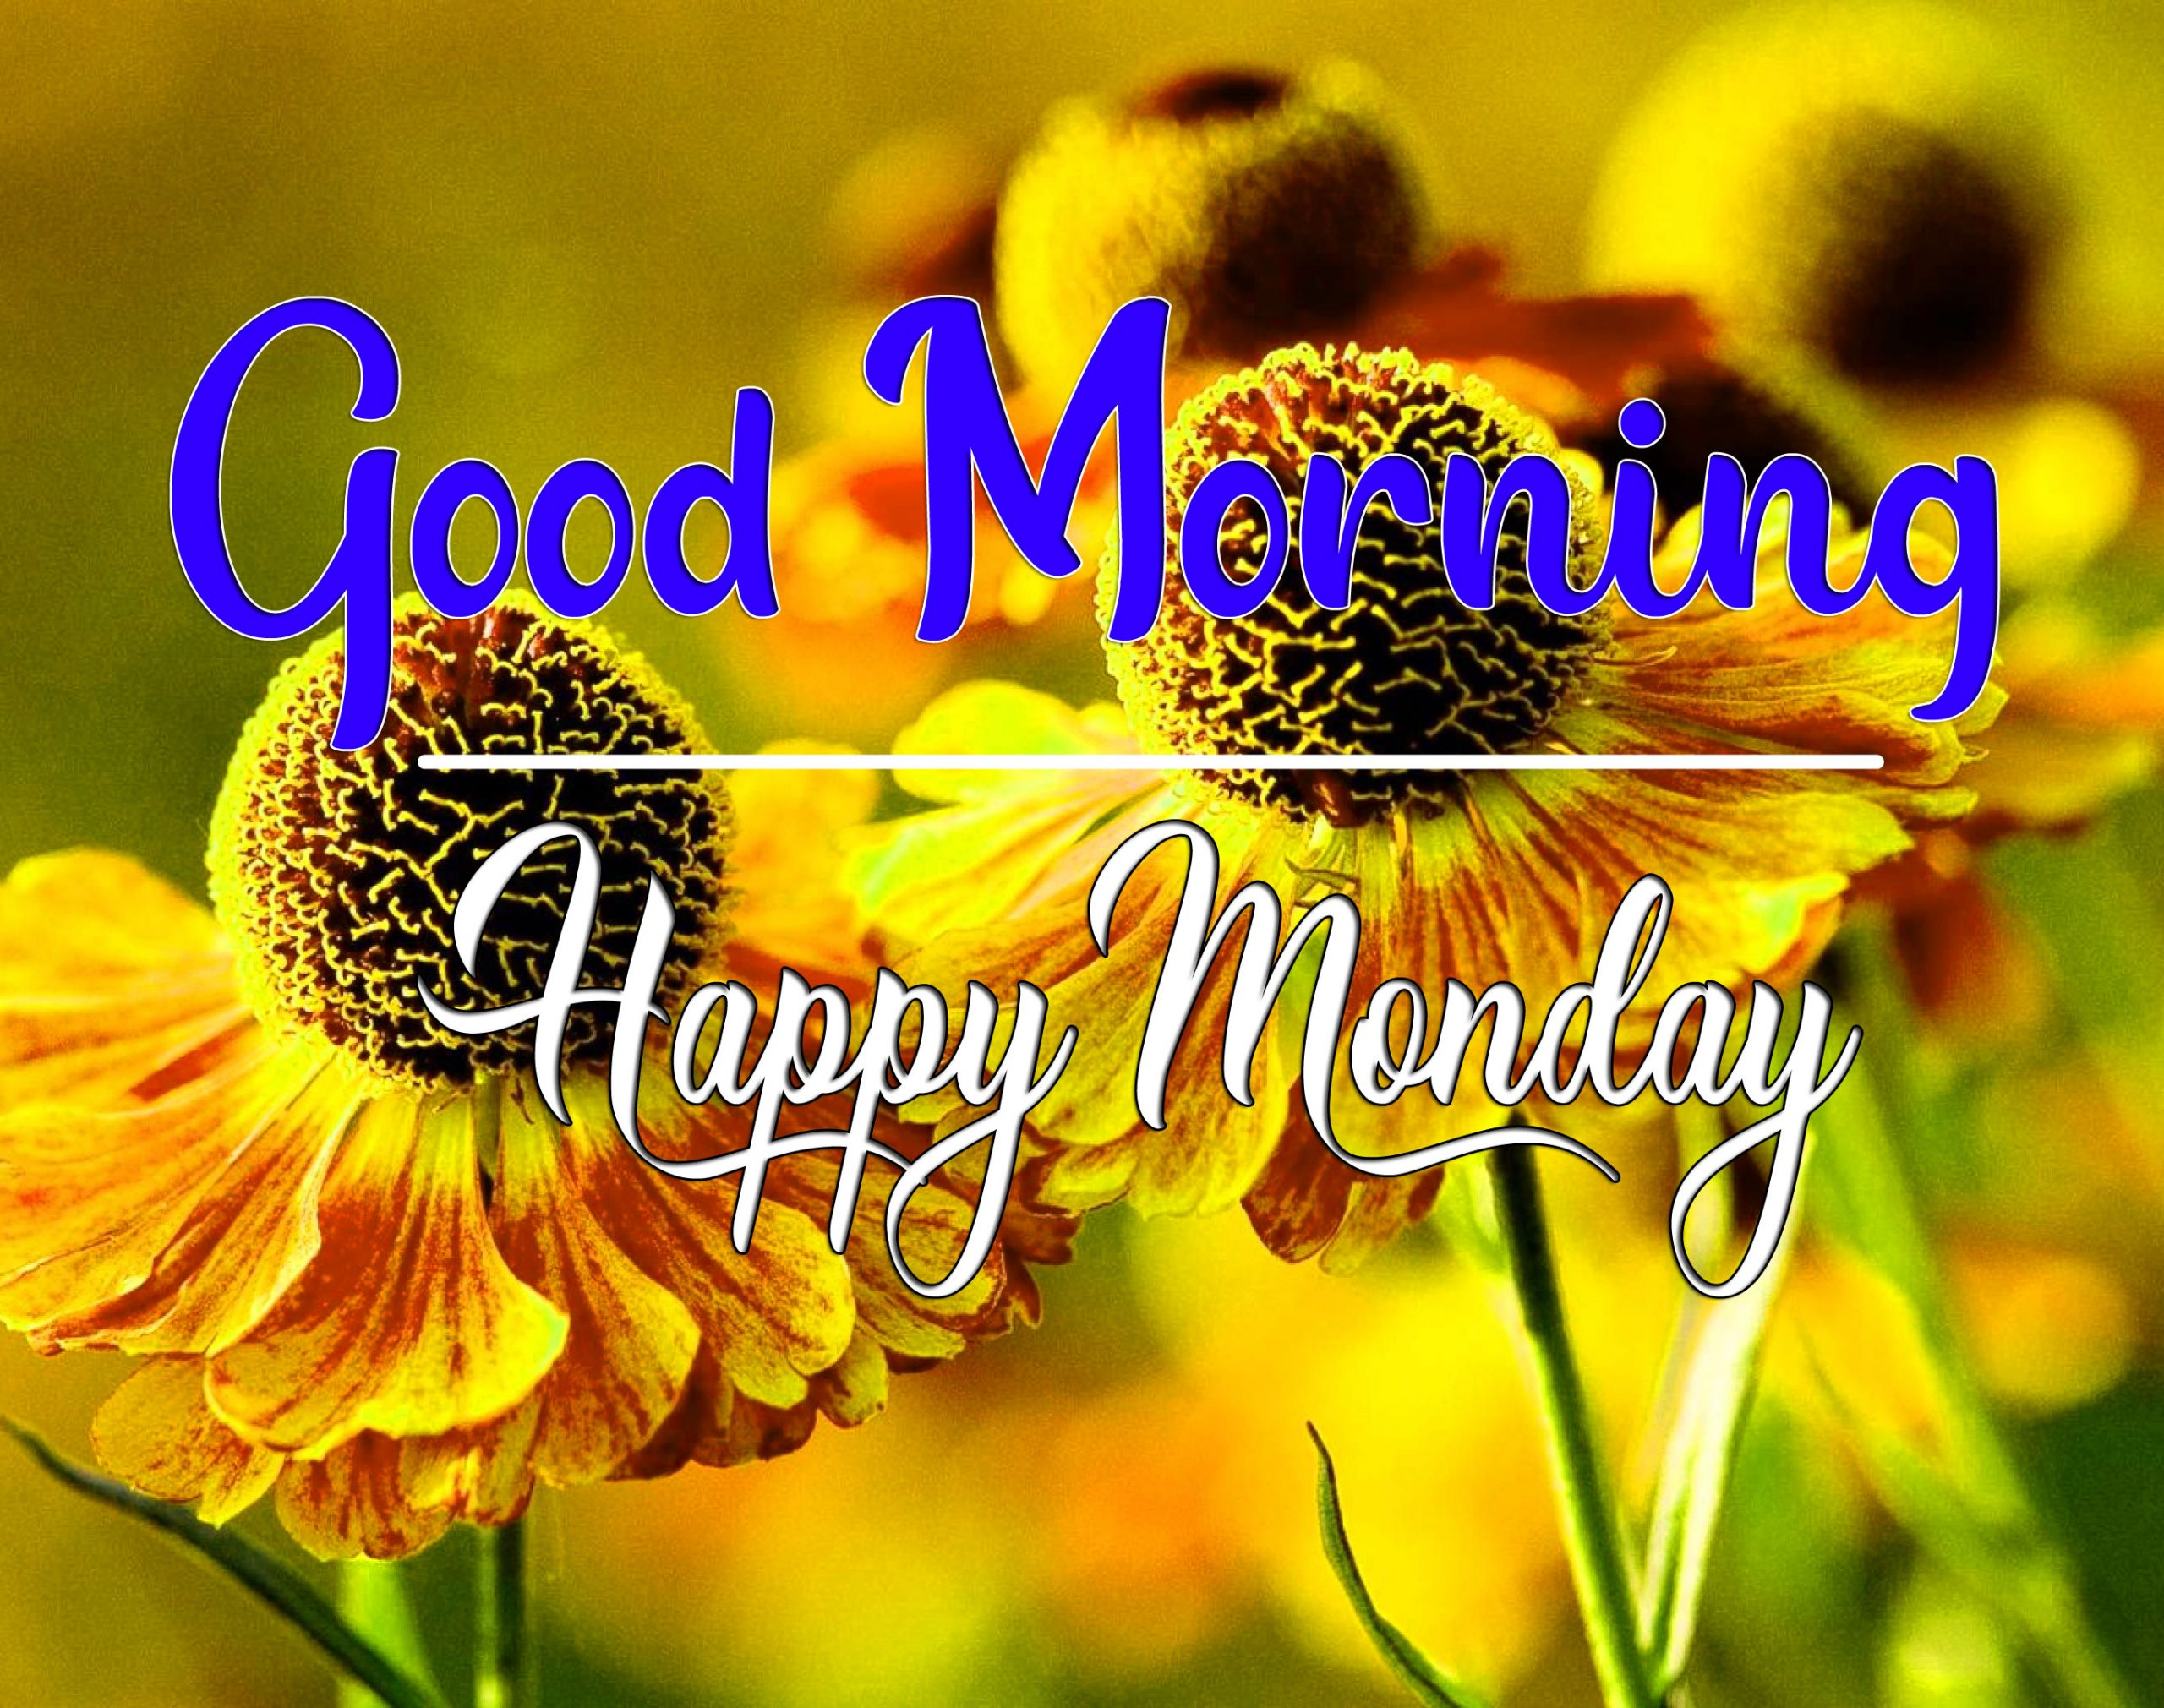 Monday Good Morning Pics HD Download 1